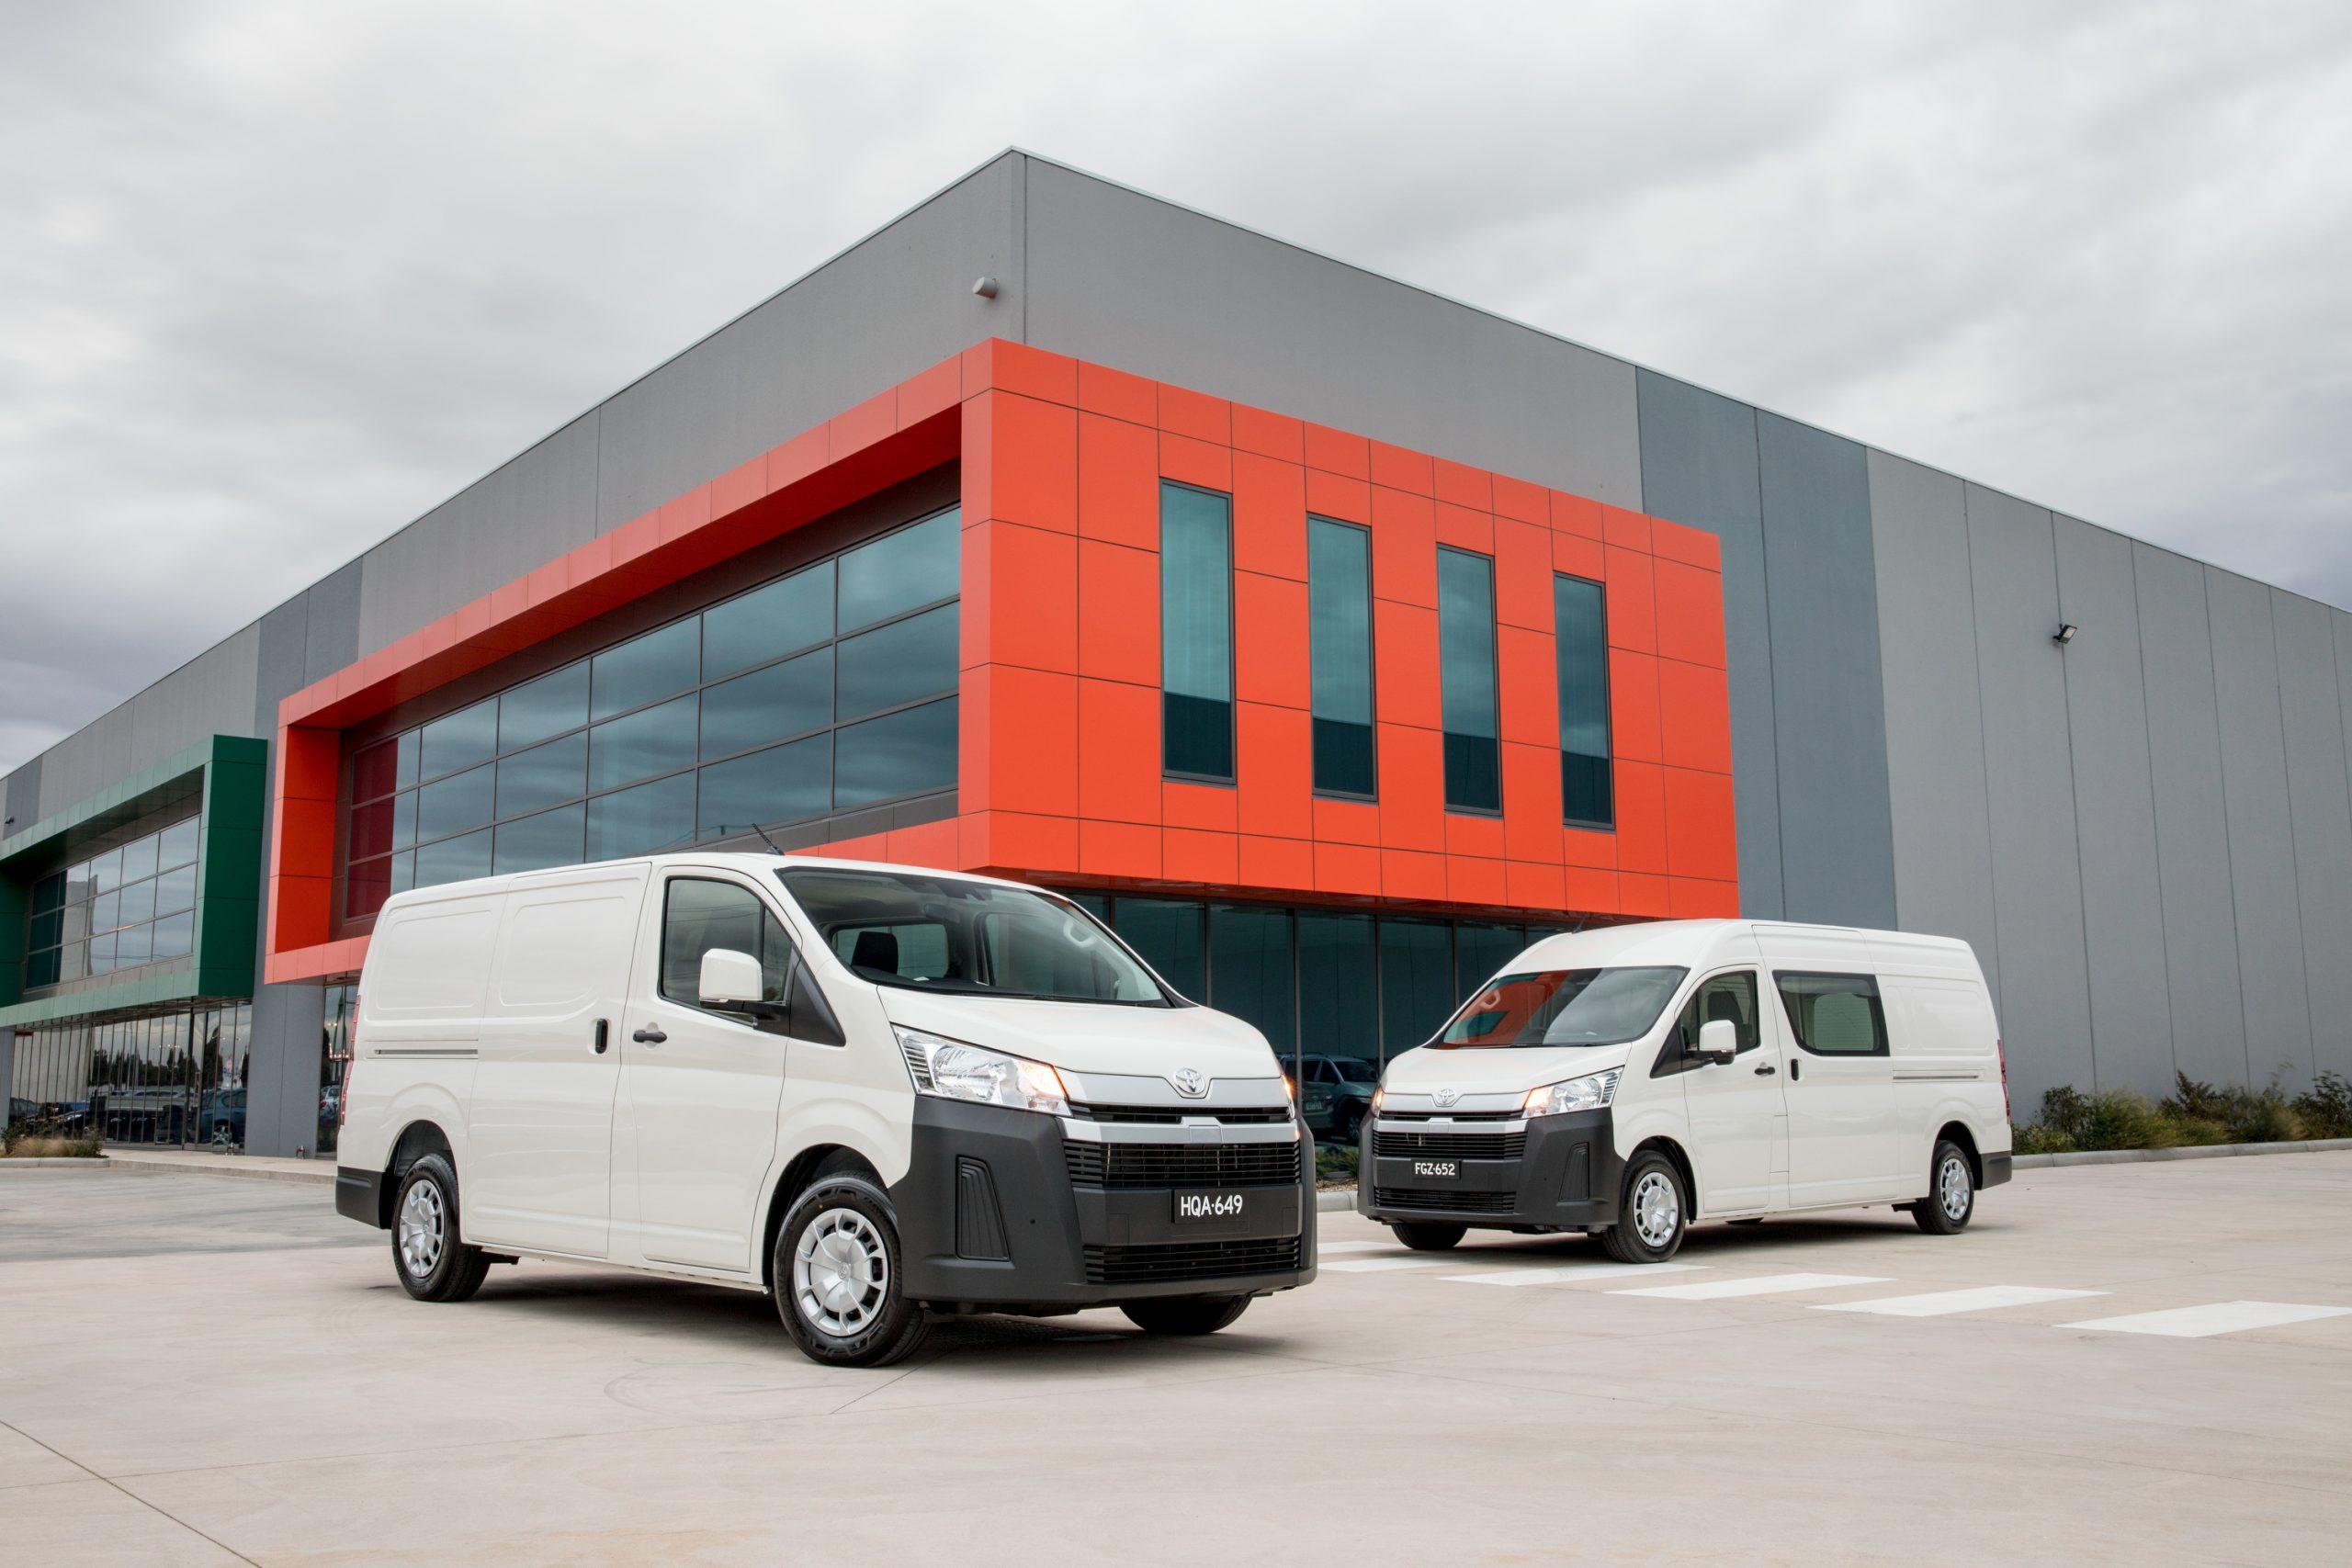 2019 Toyota HiAce  LWB Van (L) and SLWB Van (R).